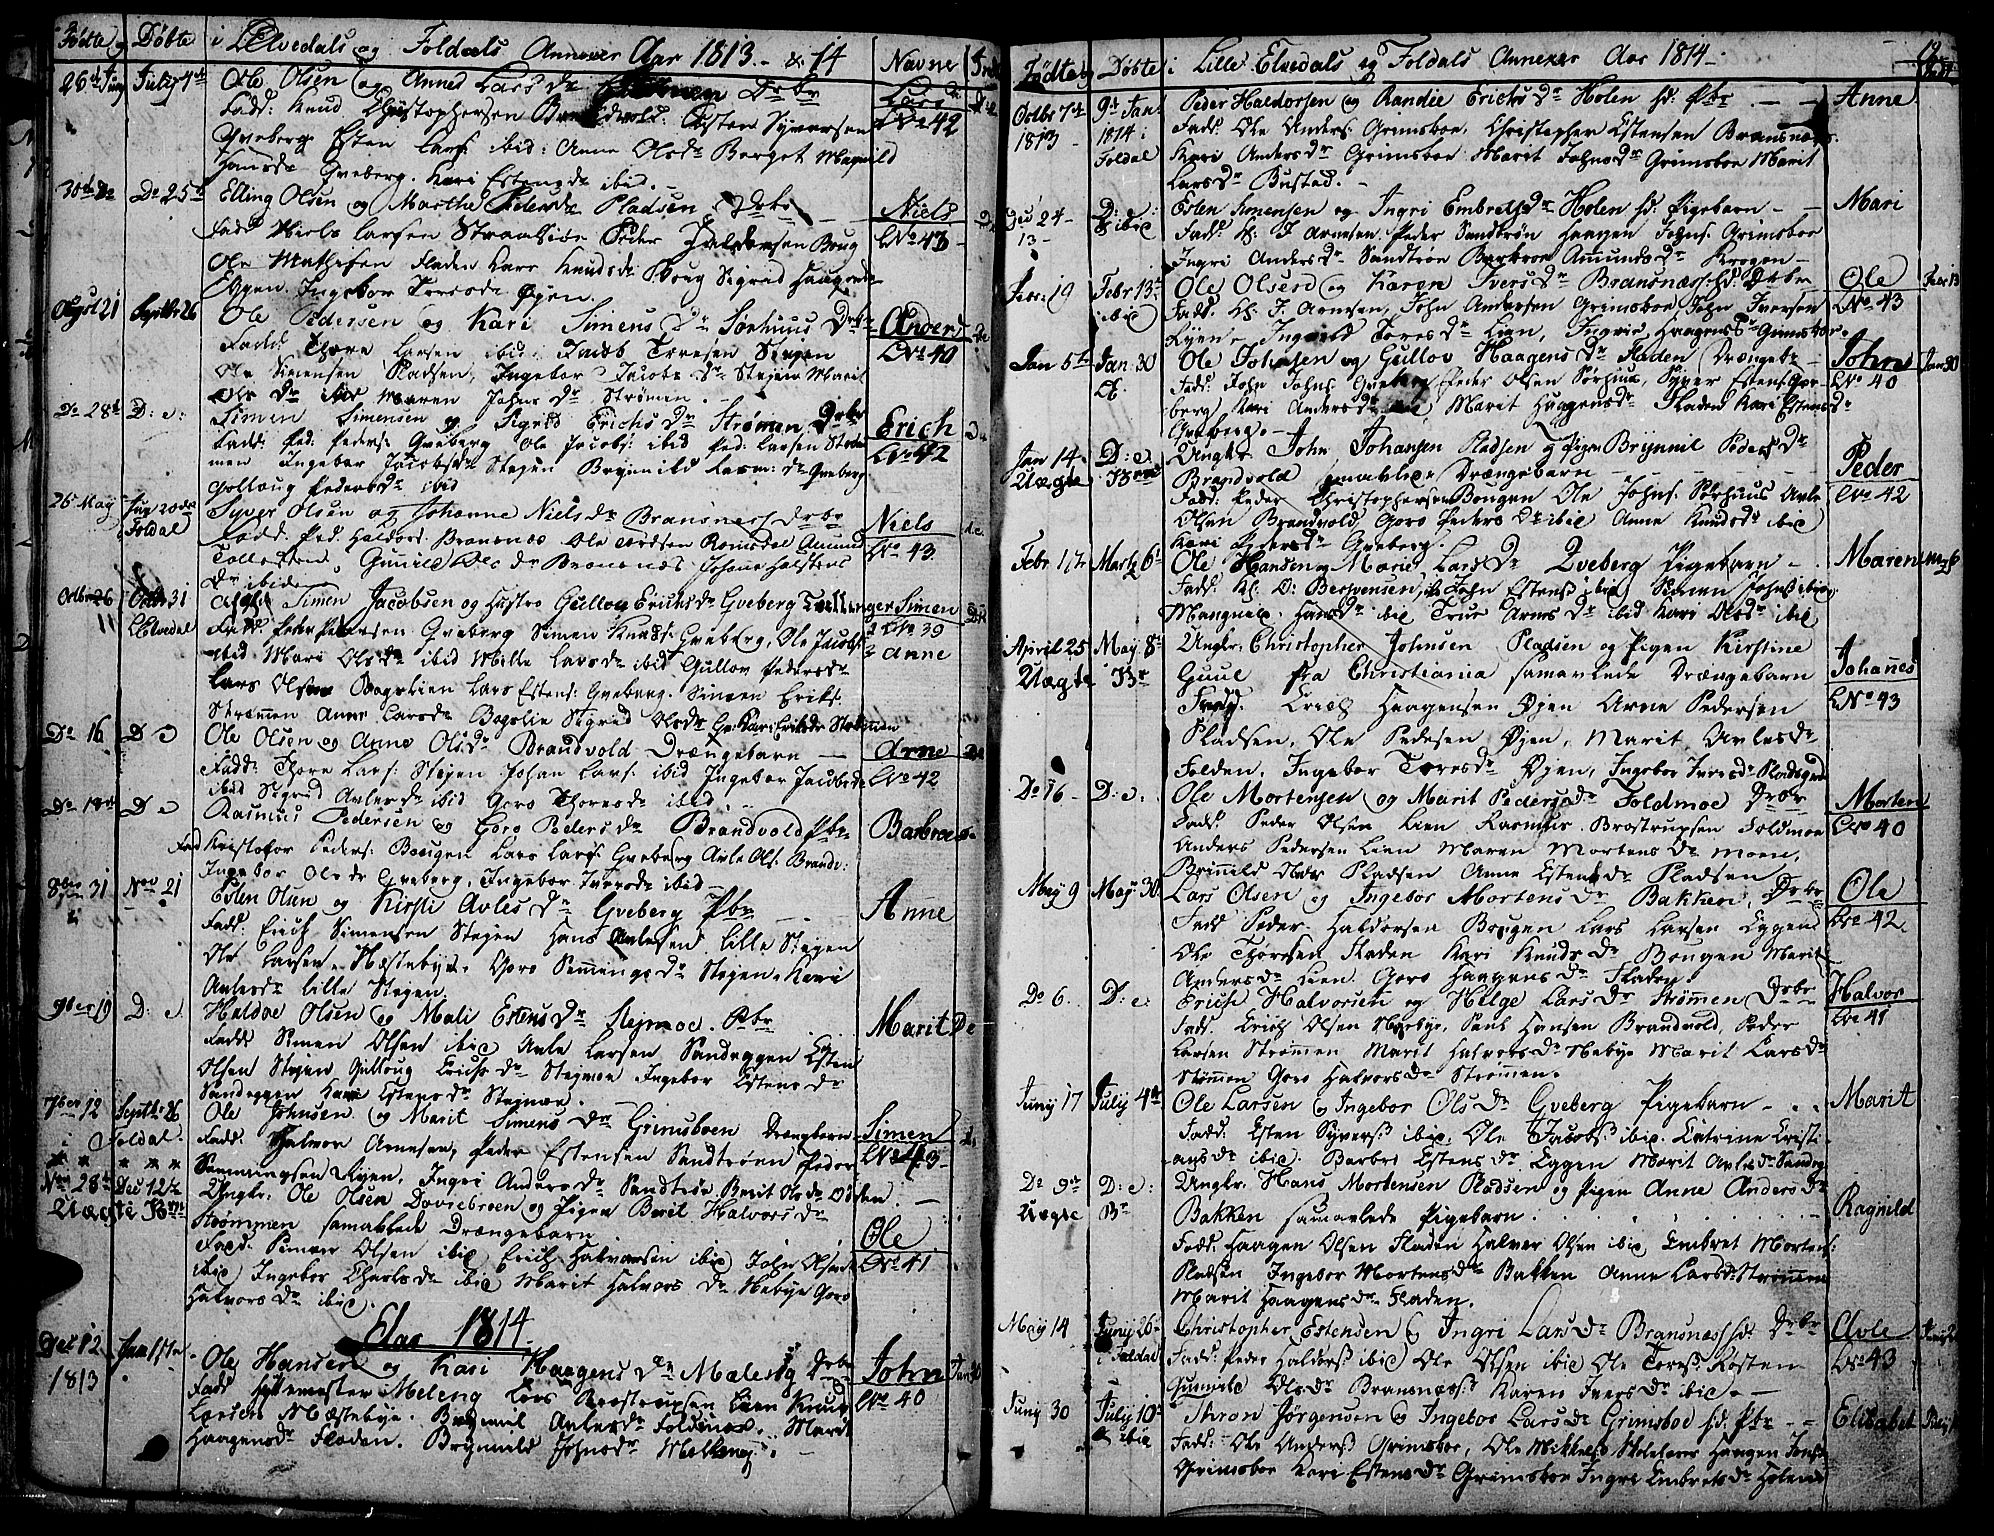 SAH, Tynset prestekontor, Ministerialbok nr. 16, 1801-1814, s. 19